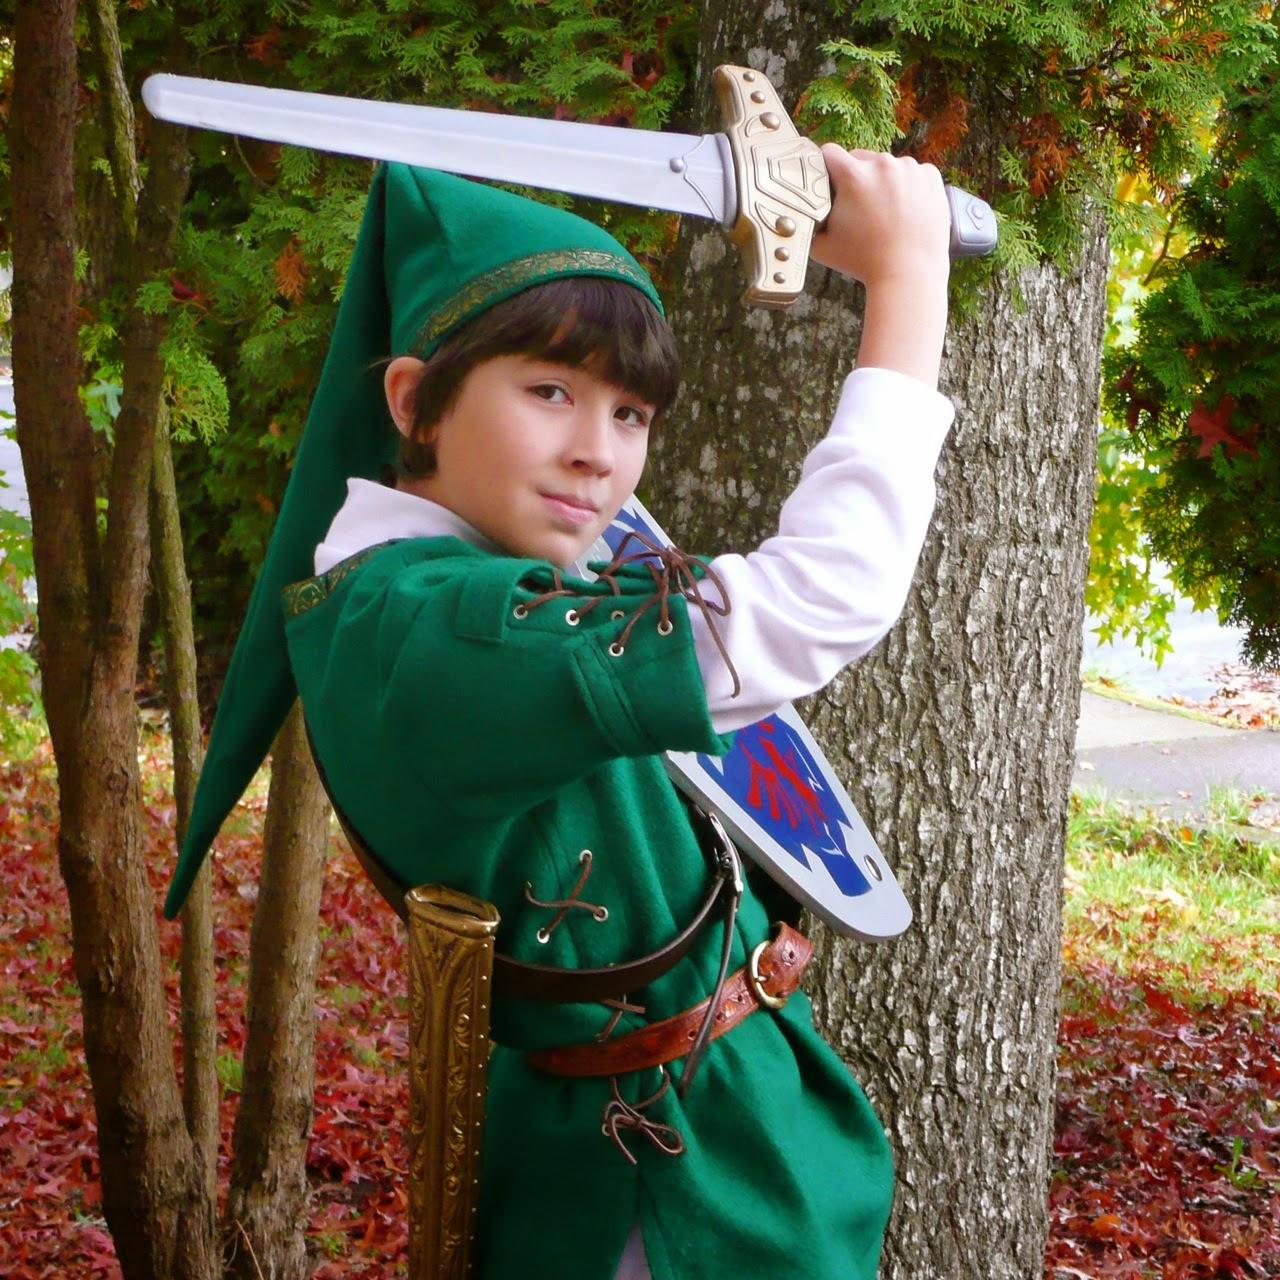 Zelda, costume, boy, kid, fun, sword, shield, Nintendo, video game, cosplay